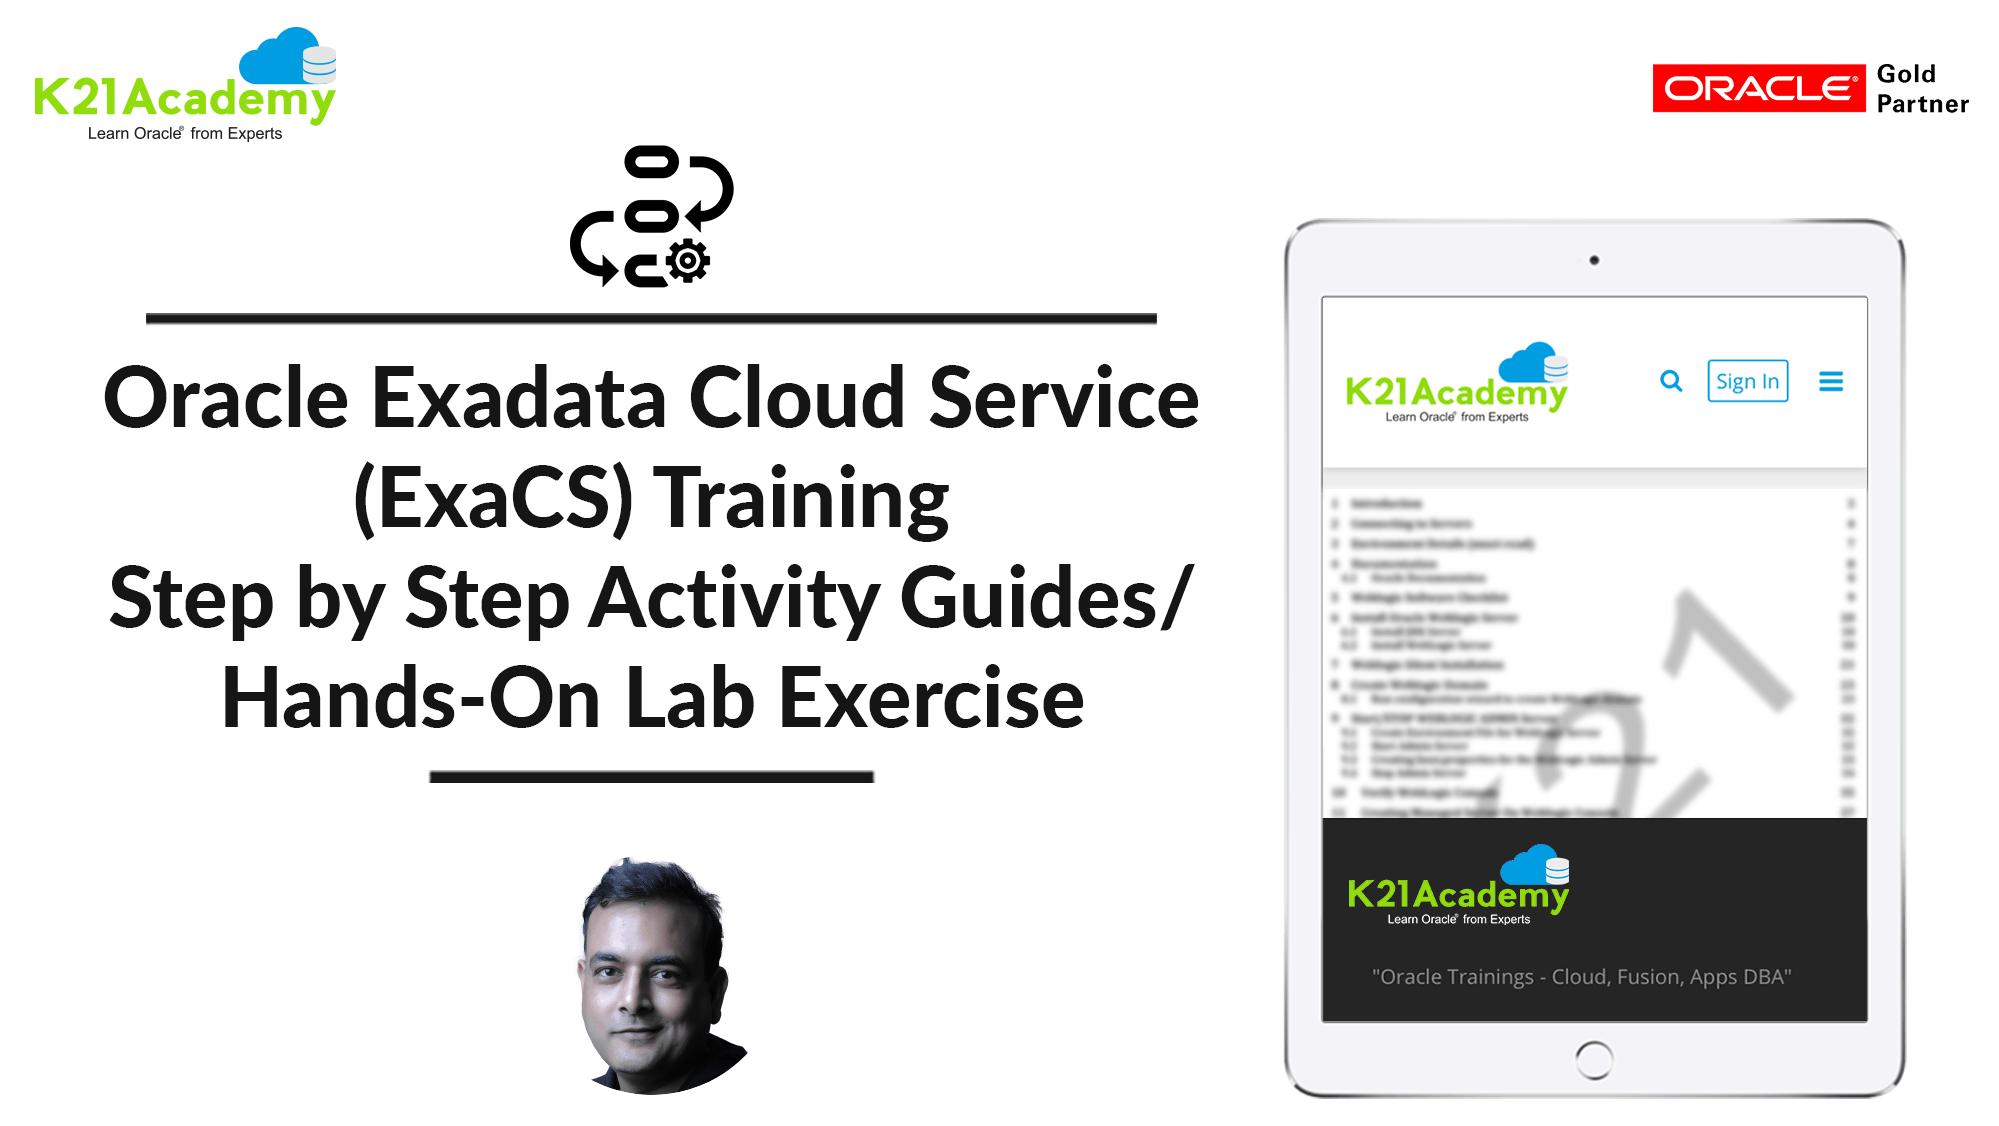 Oracle Exadata Cloud Service (ExaCS) Training: Step-By